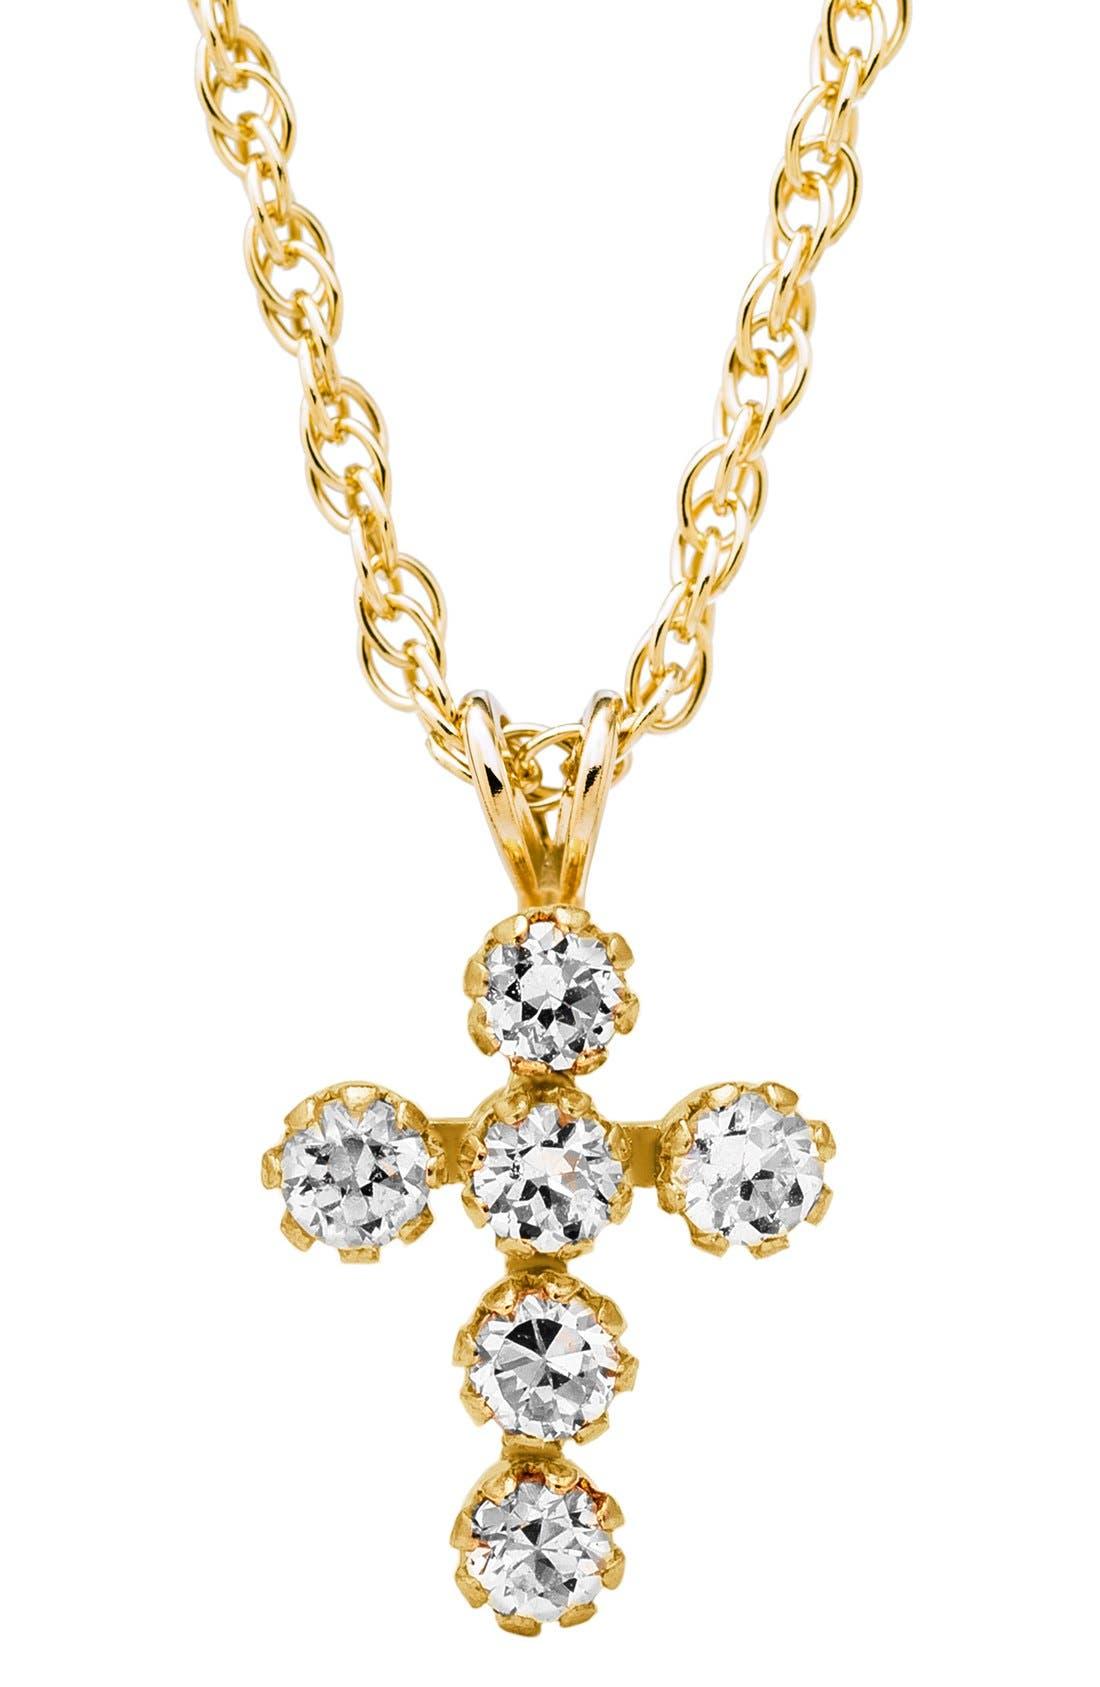 14k Gold & Cubic Zirconia Cross Necklace,                             Alternate thumbnail 2, color,                             710